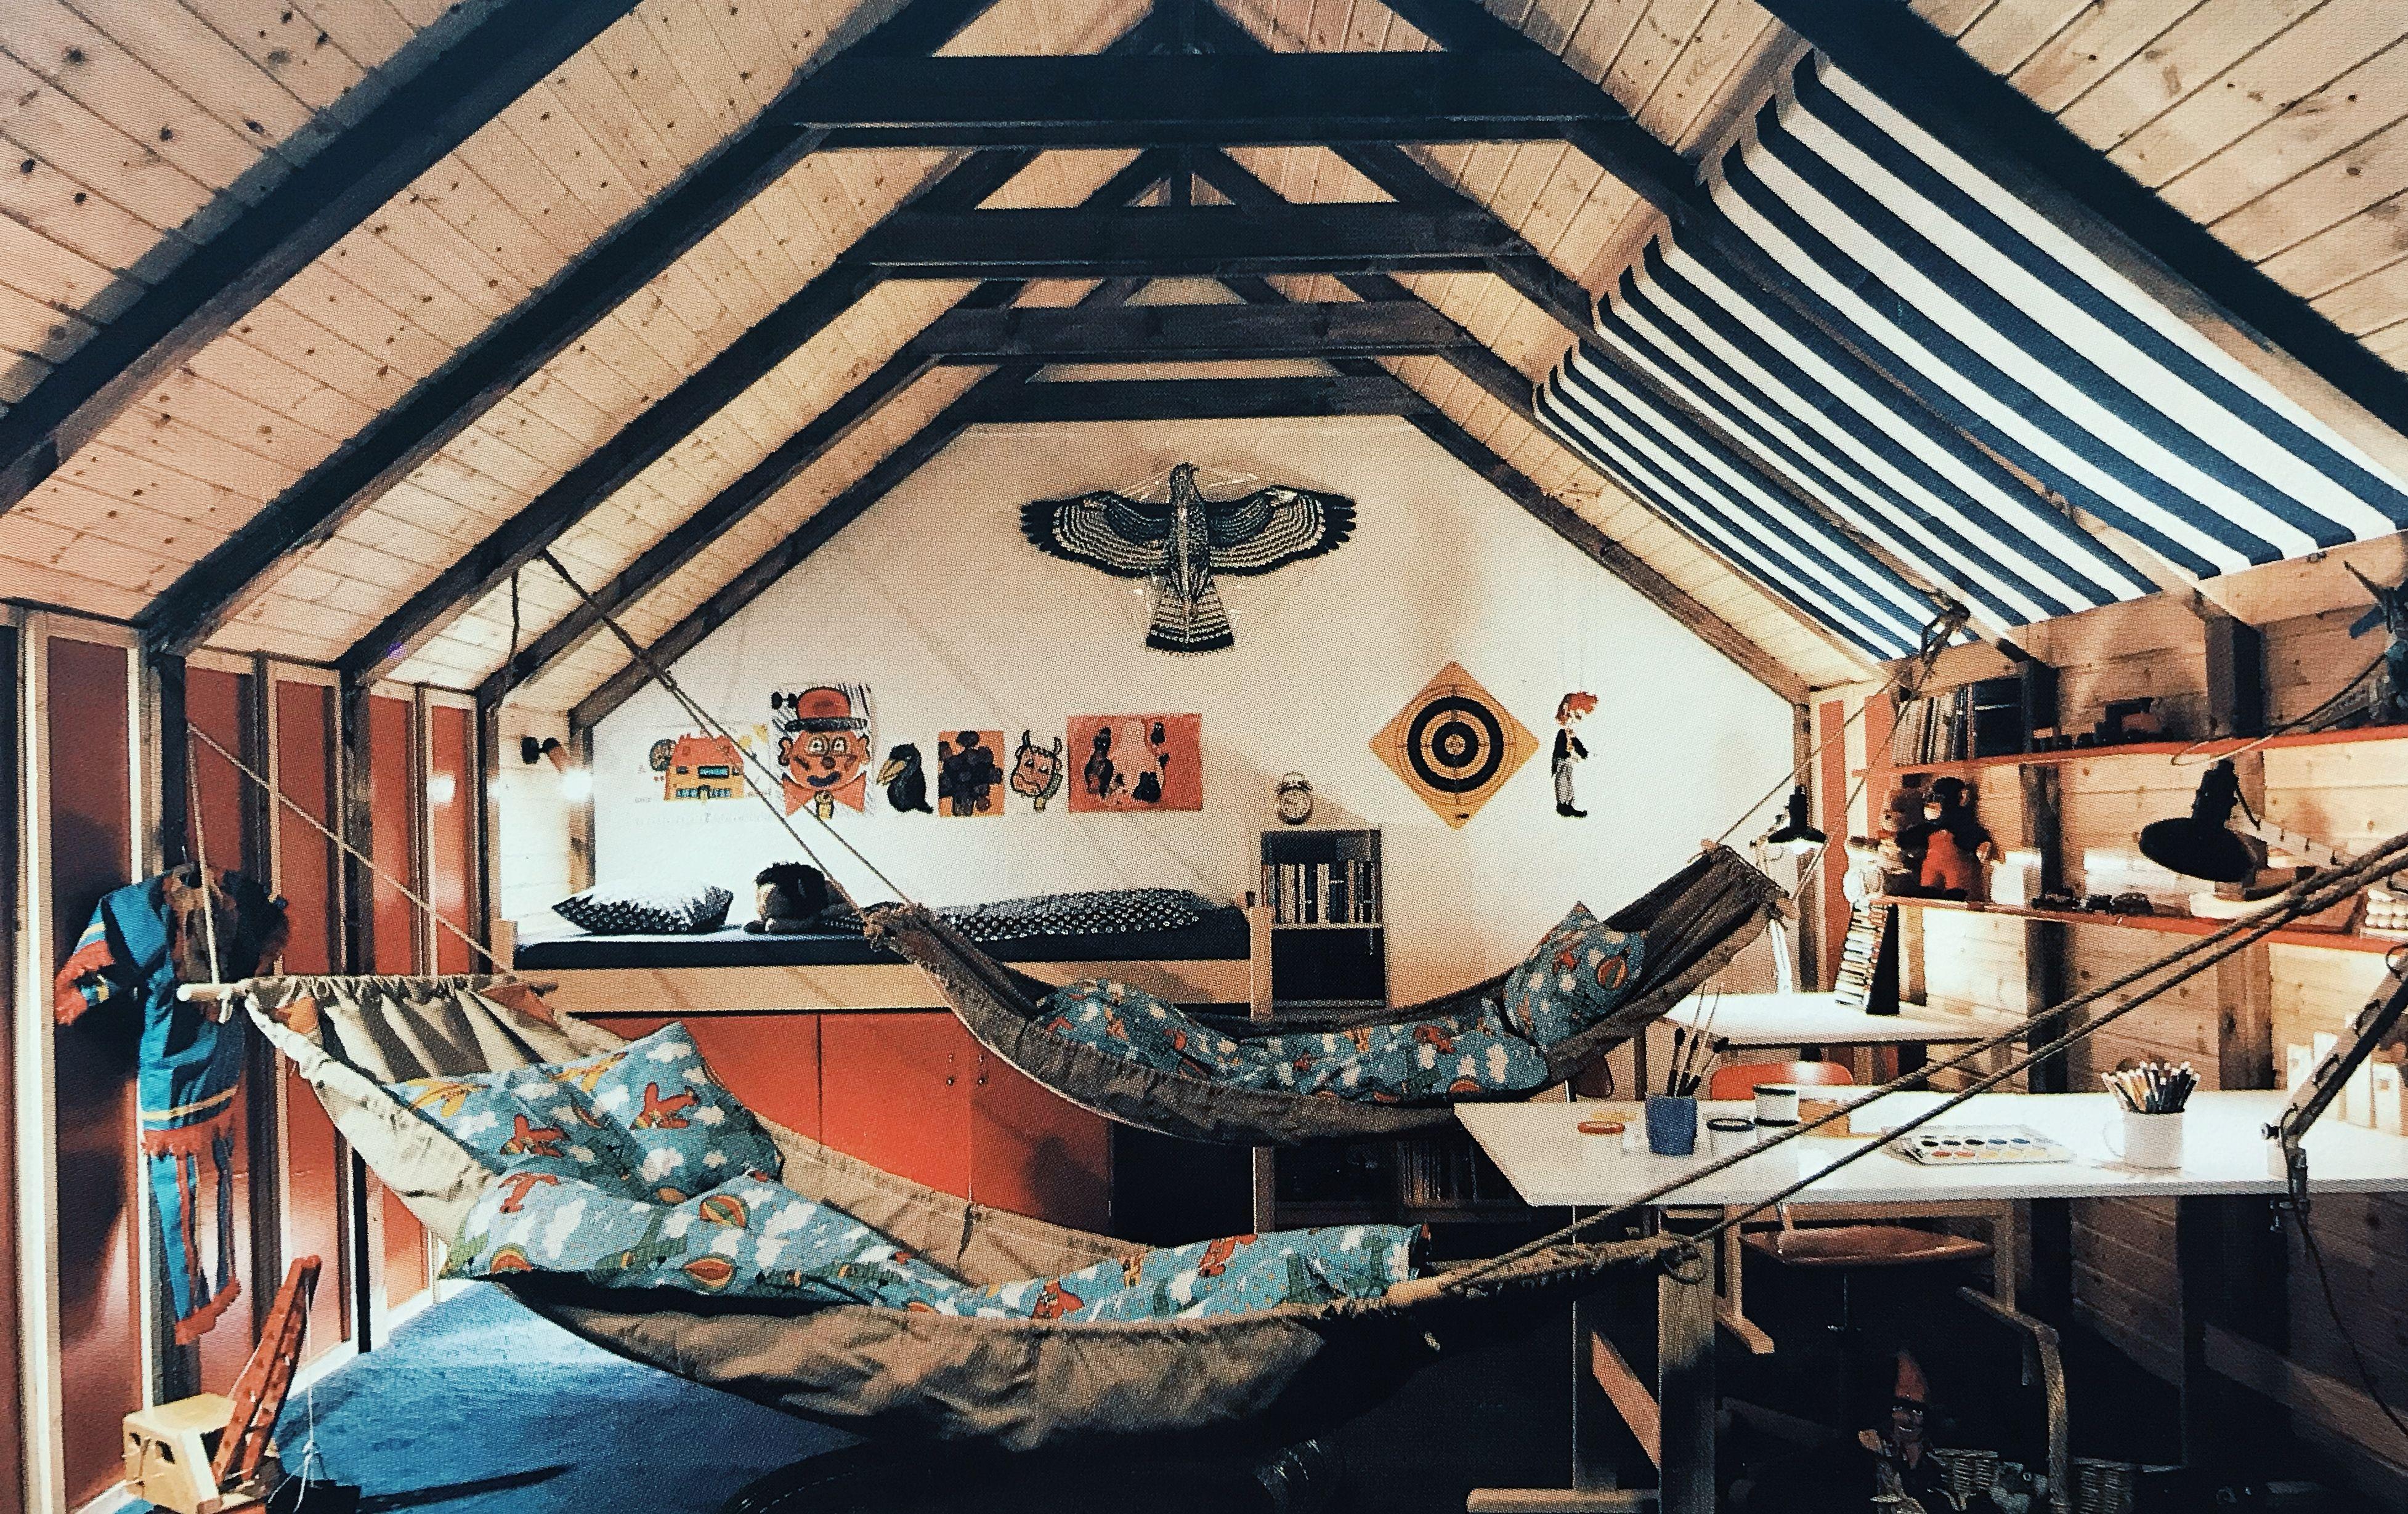 Terence conranus new house book kids rumpus room reclaimed beams